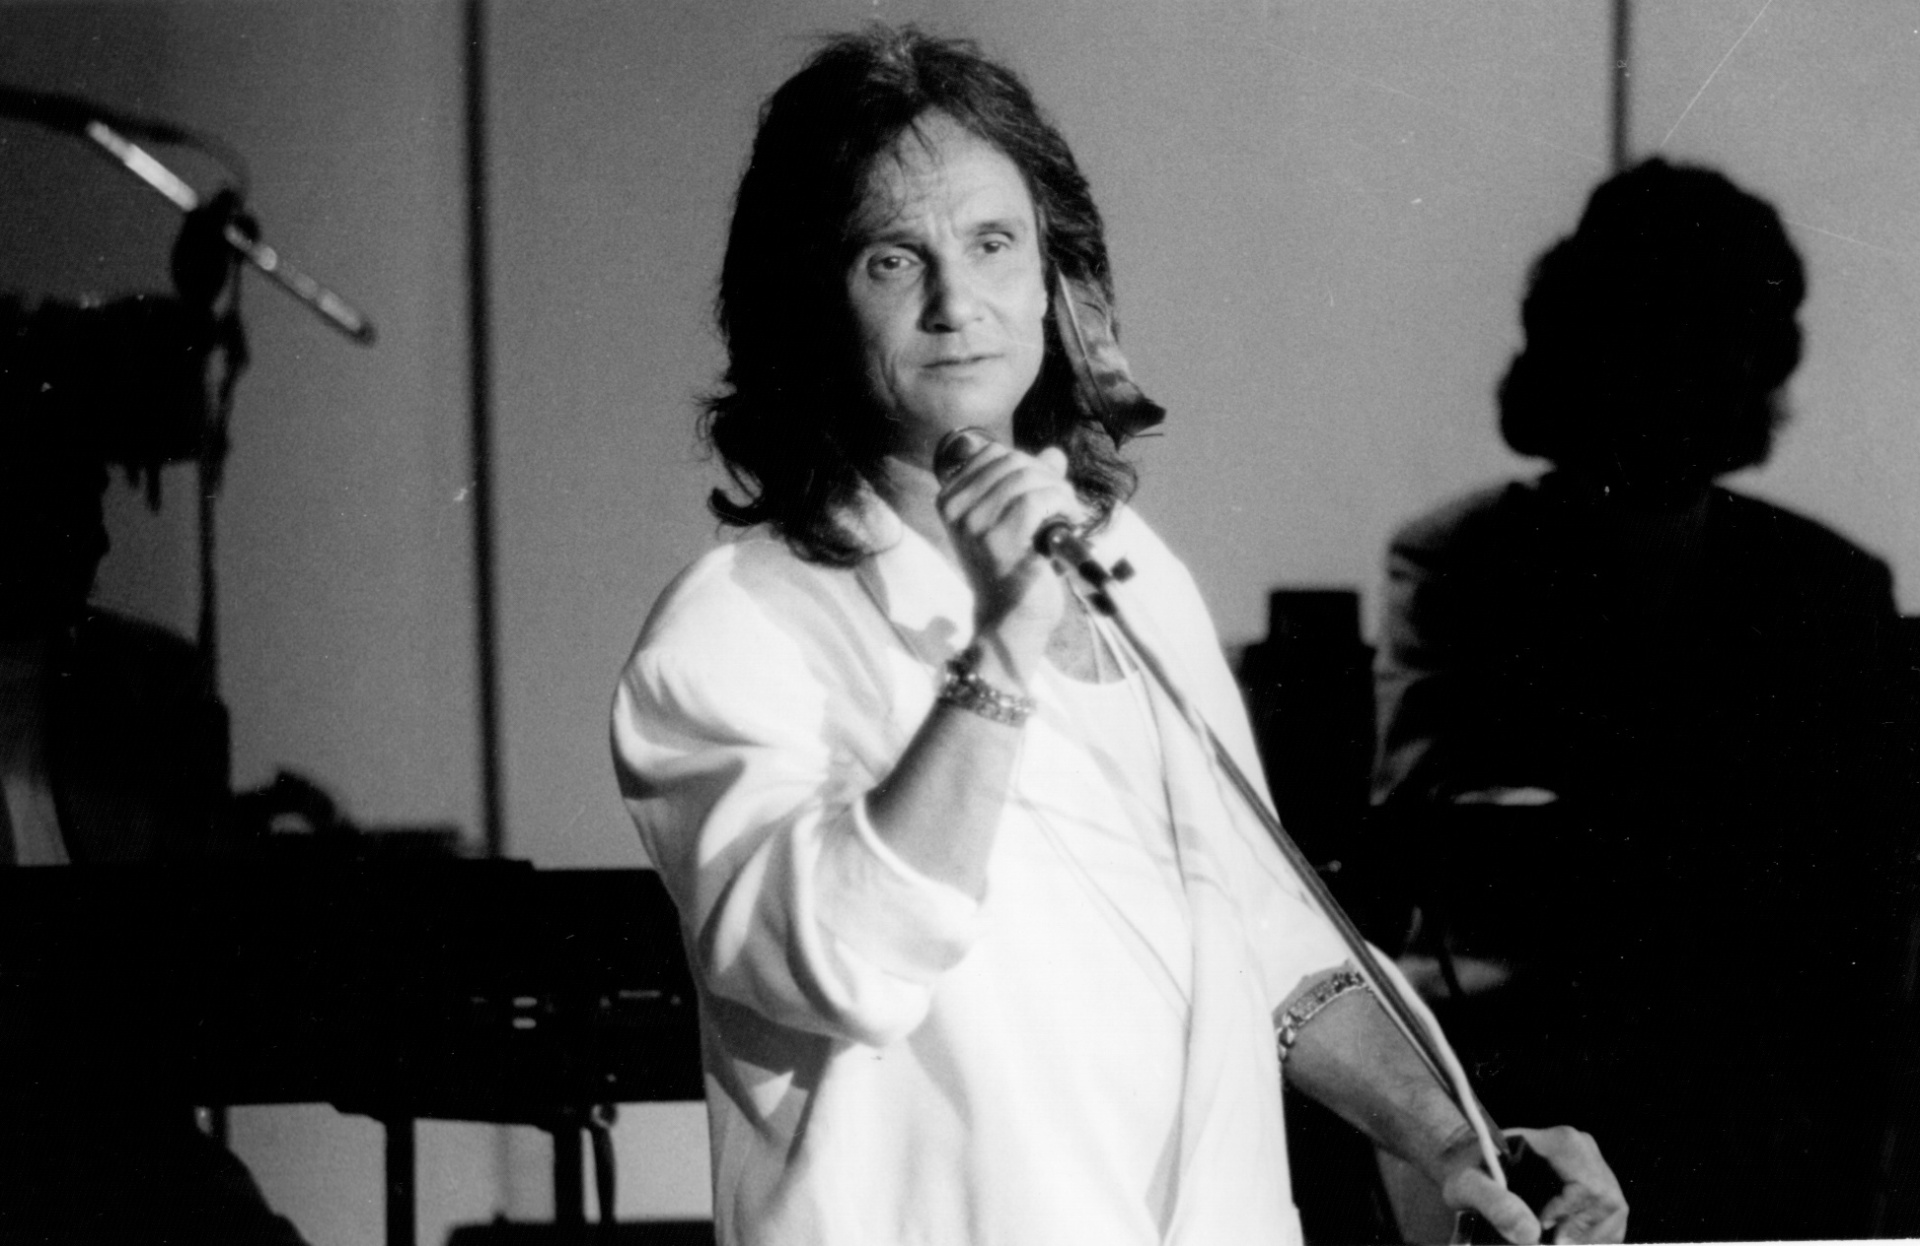 Com os cabelos longos, Roberto Carlos grava o especial de 1989